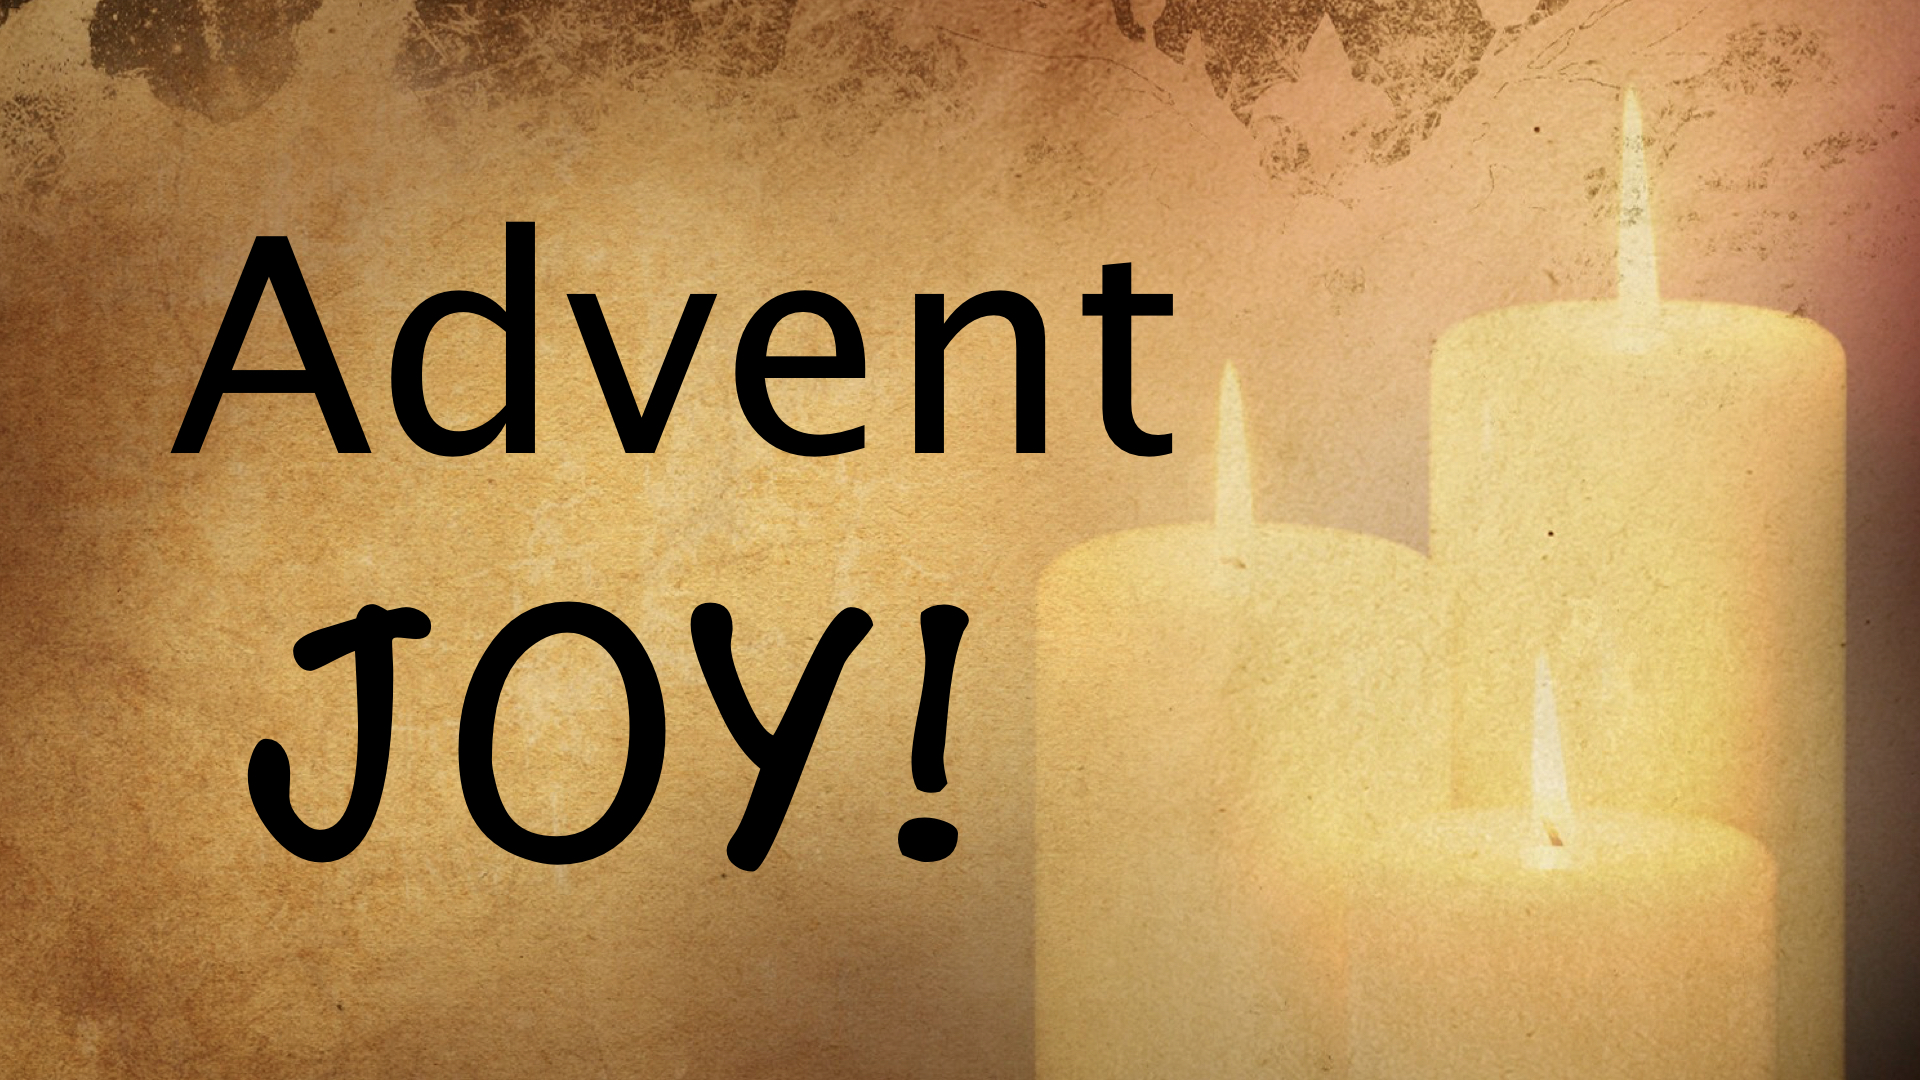 advent week 3 joy faithlife sermons. Black Bedroom Furniture Sets. Home Design Ideas